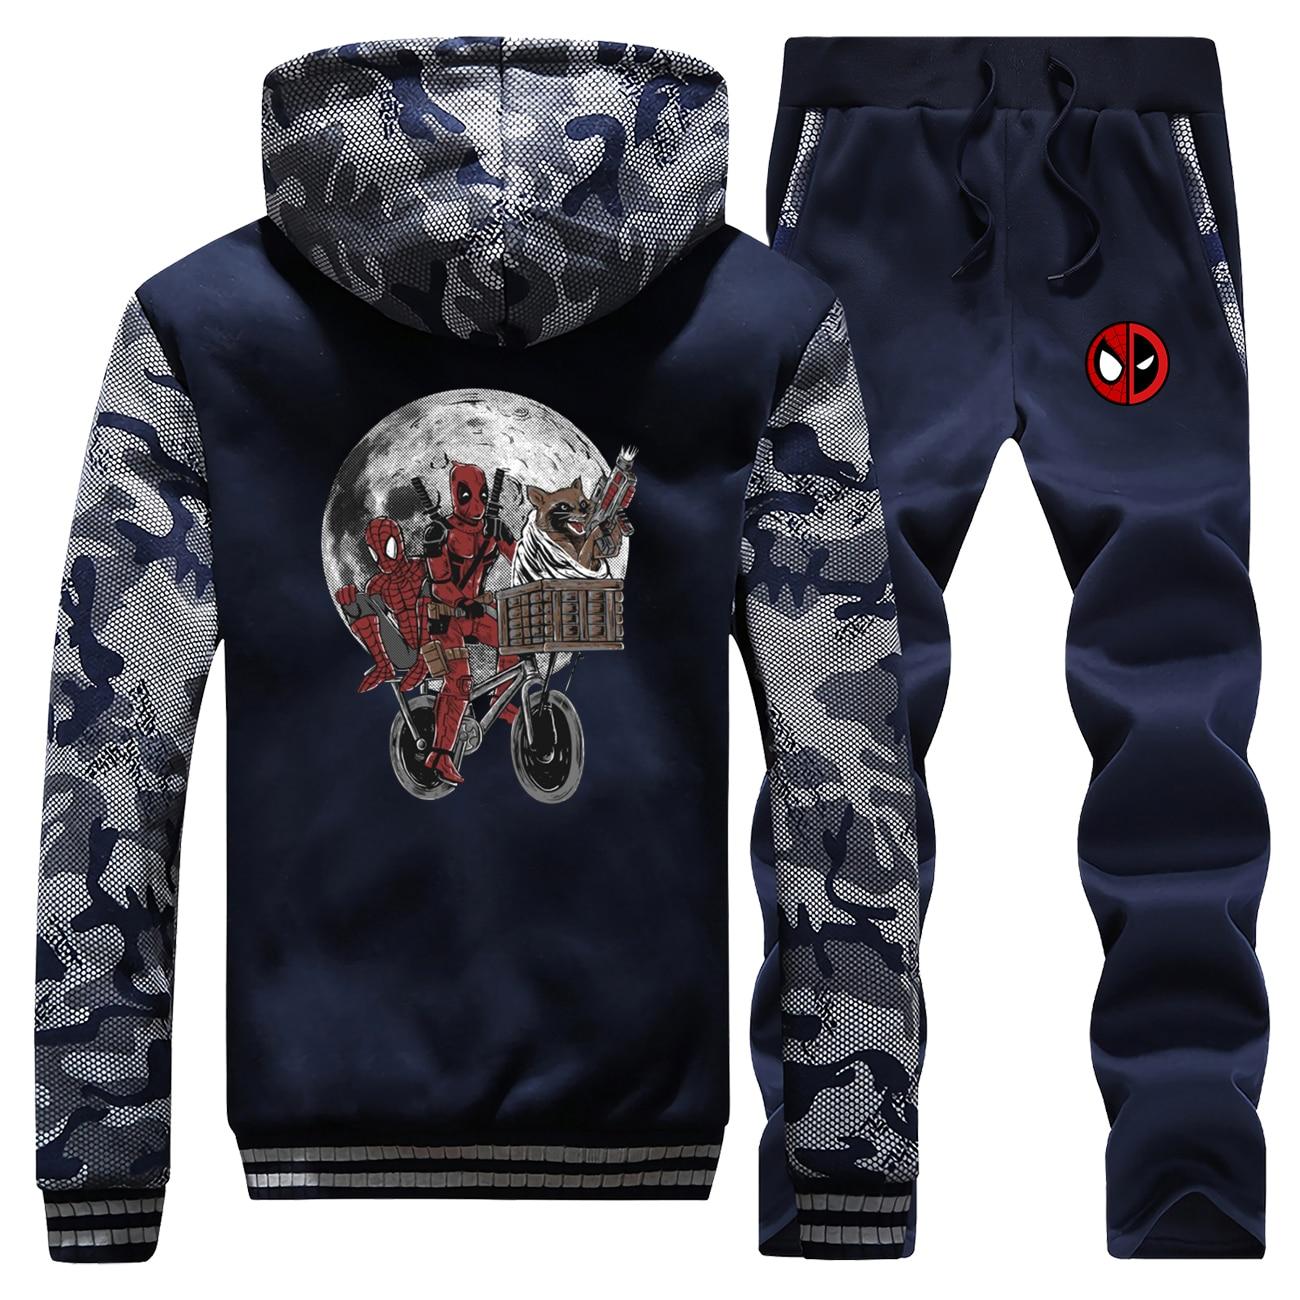 Deadpool Funny Desgin Camo Male Set Fitness Hip Hop Sweatsuit Spider-Man Print Thick Jackets E T Fleece Warm Pants Sweatshirts